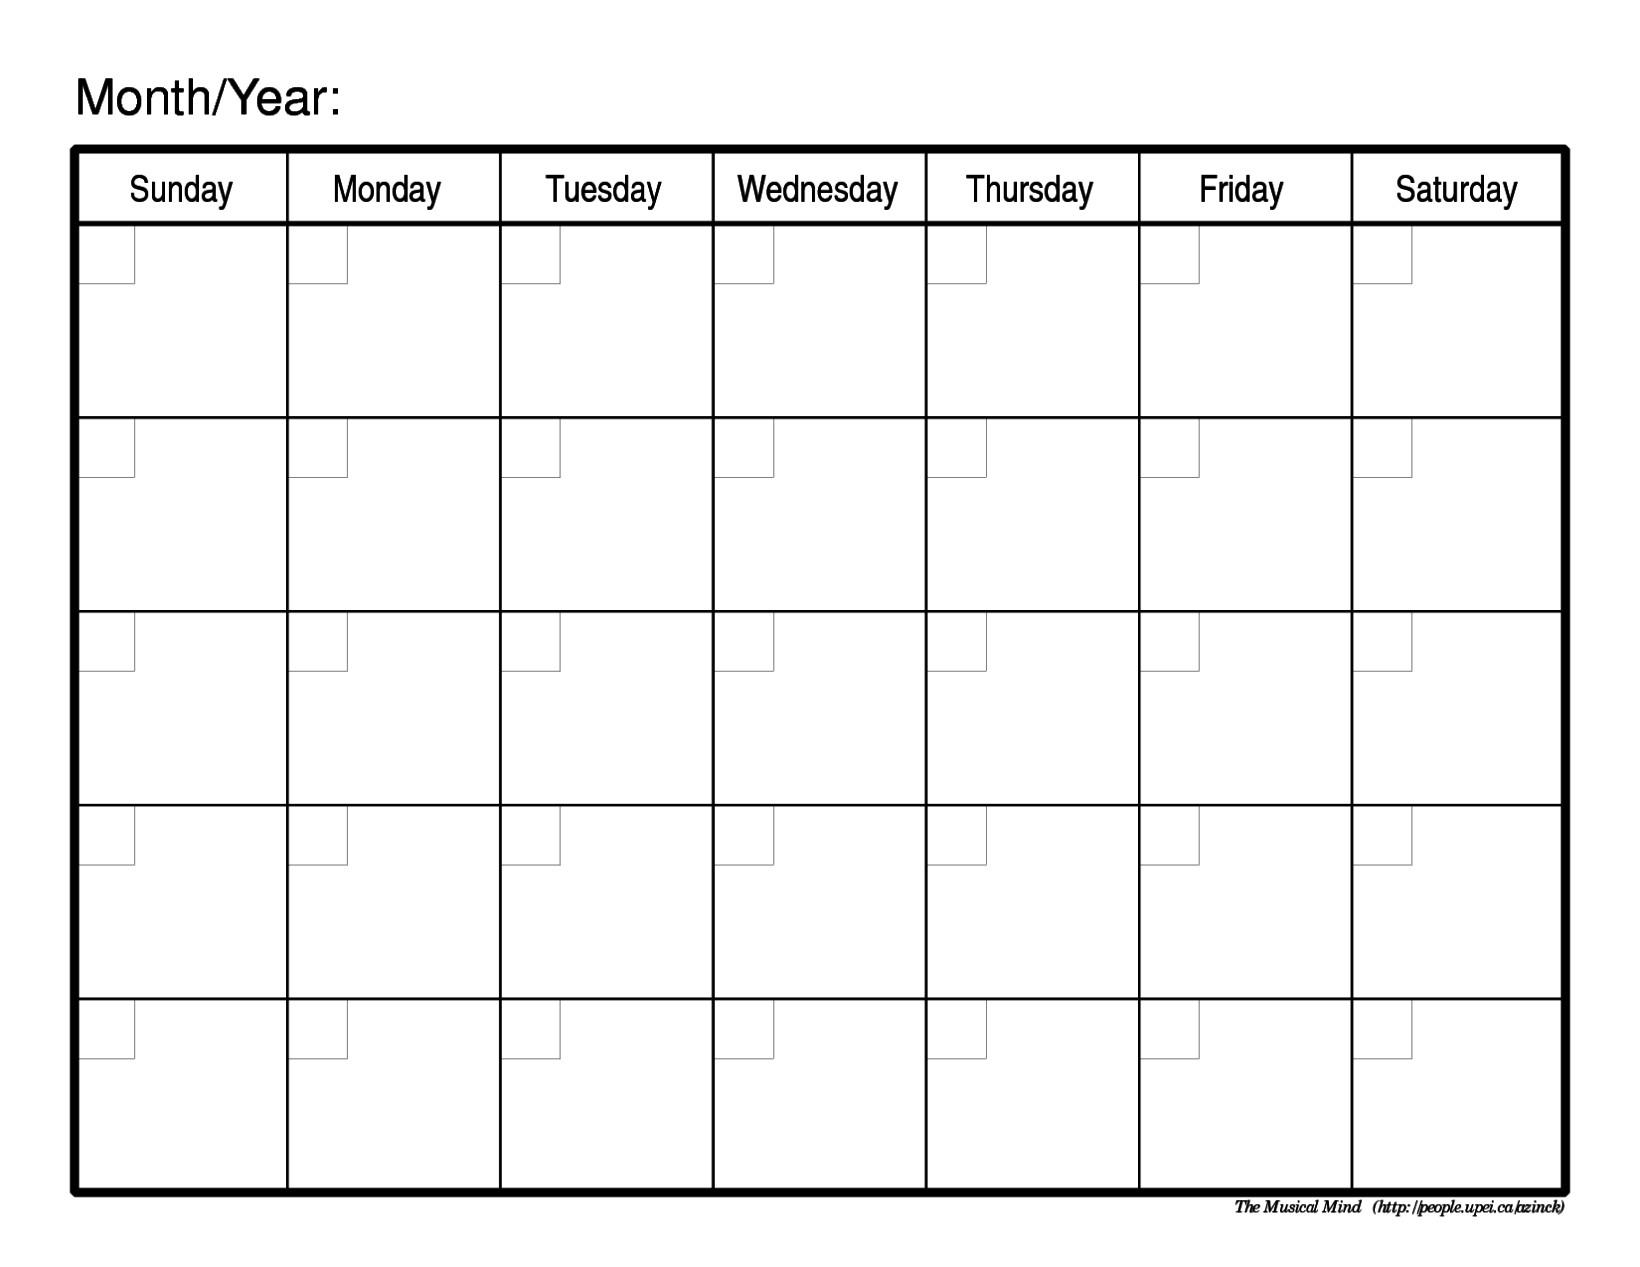 Schedule Template Free Printable Weekly Calendar Blank  Full Page Blank Month Calendar